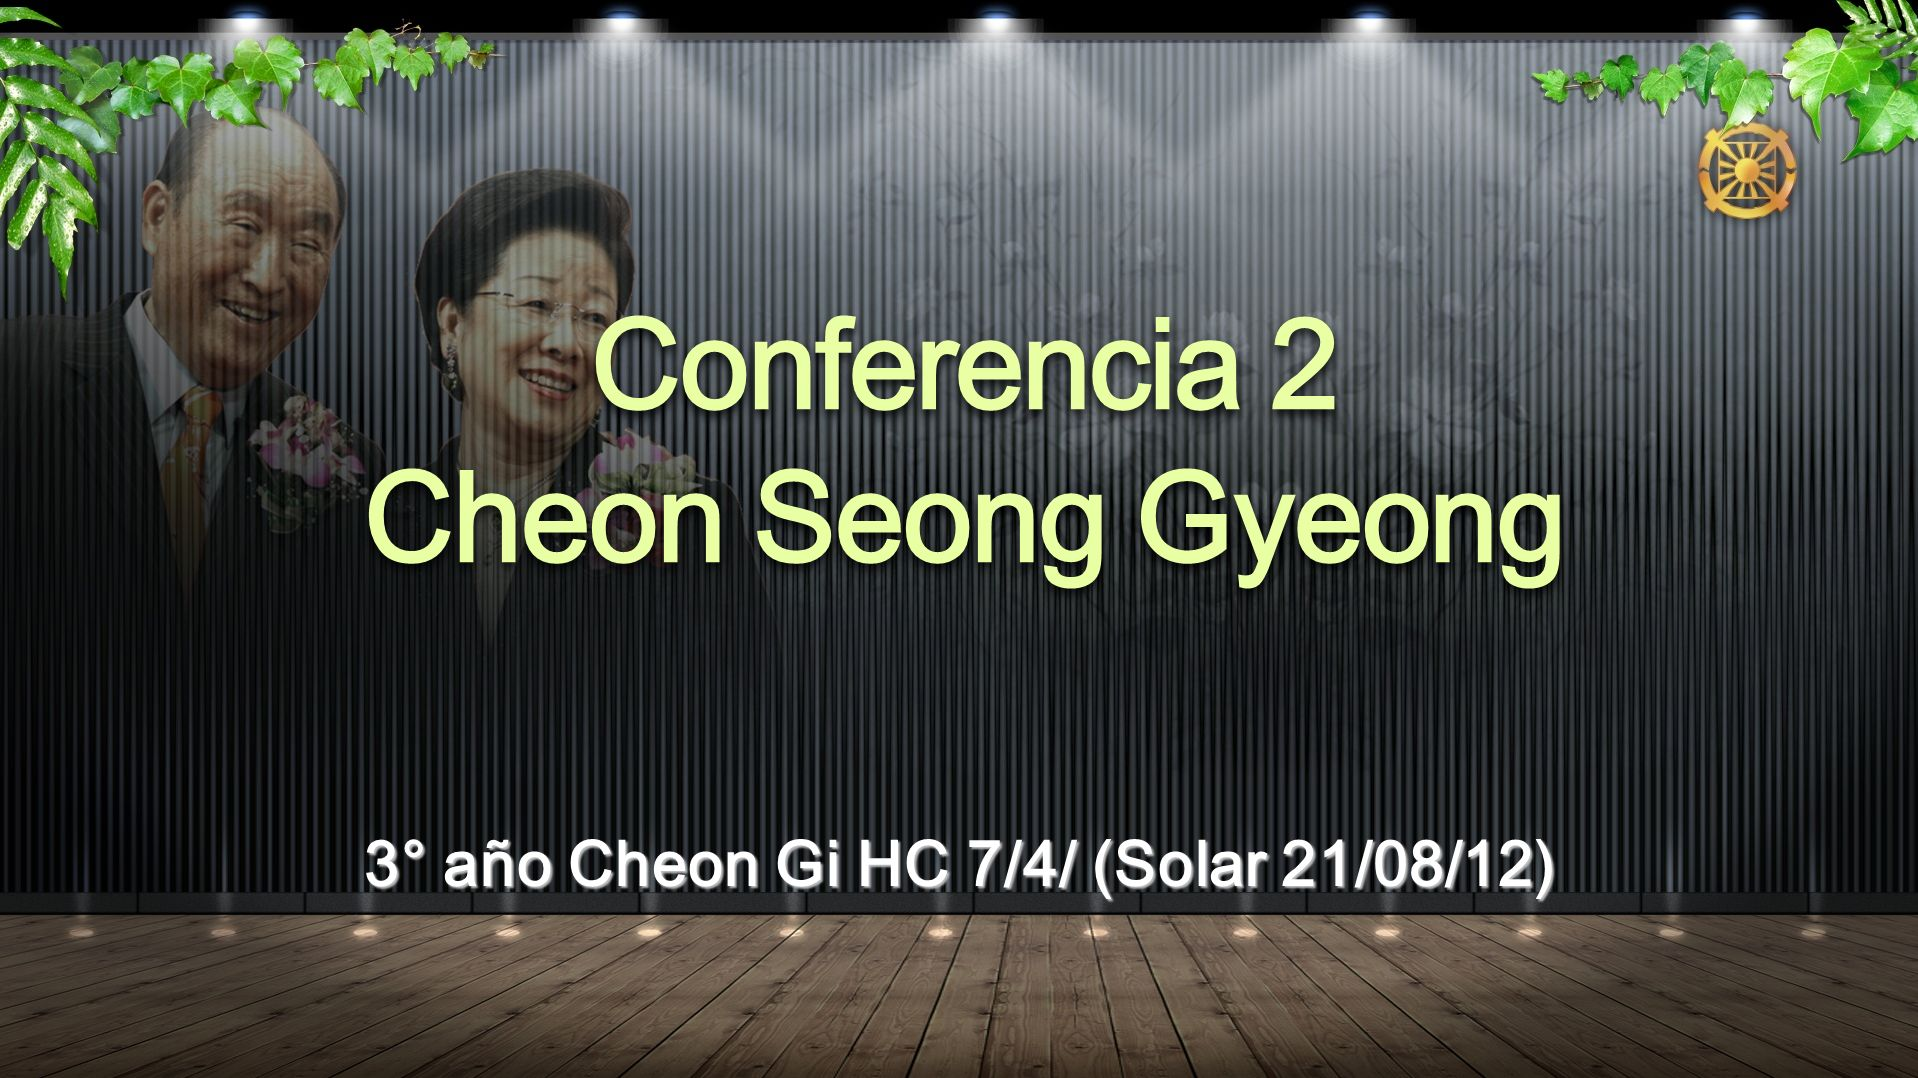 3° año Cheon Gi HC 7/4/ (Solar 21/08/12)